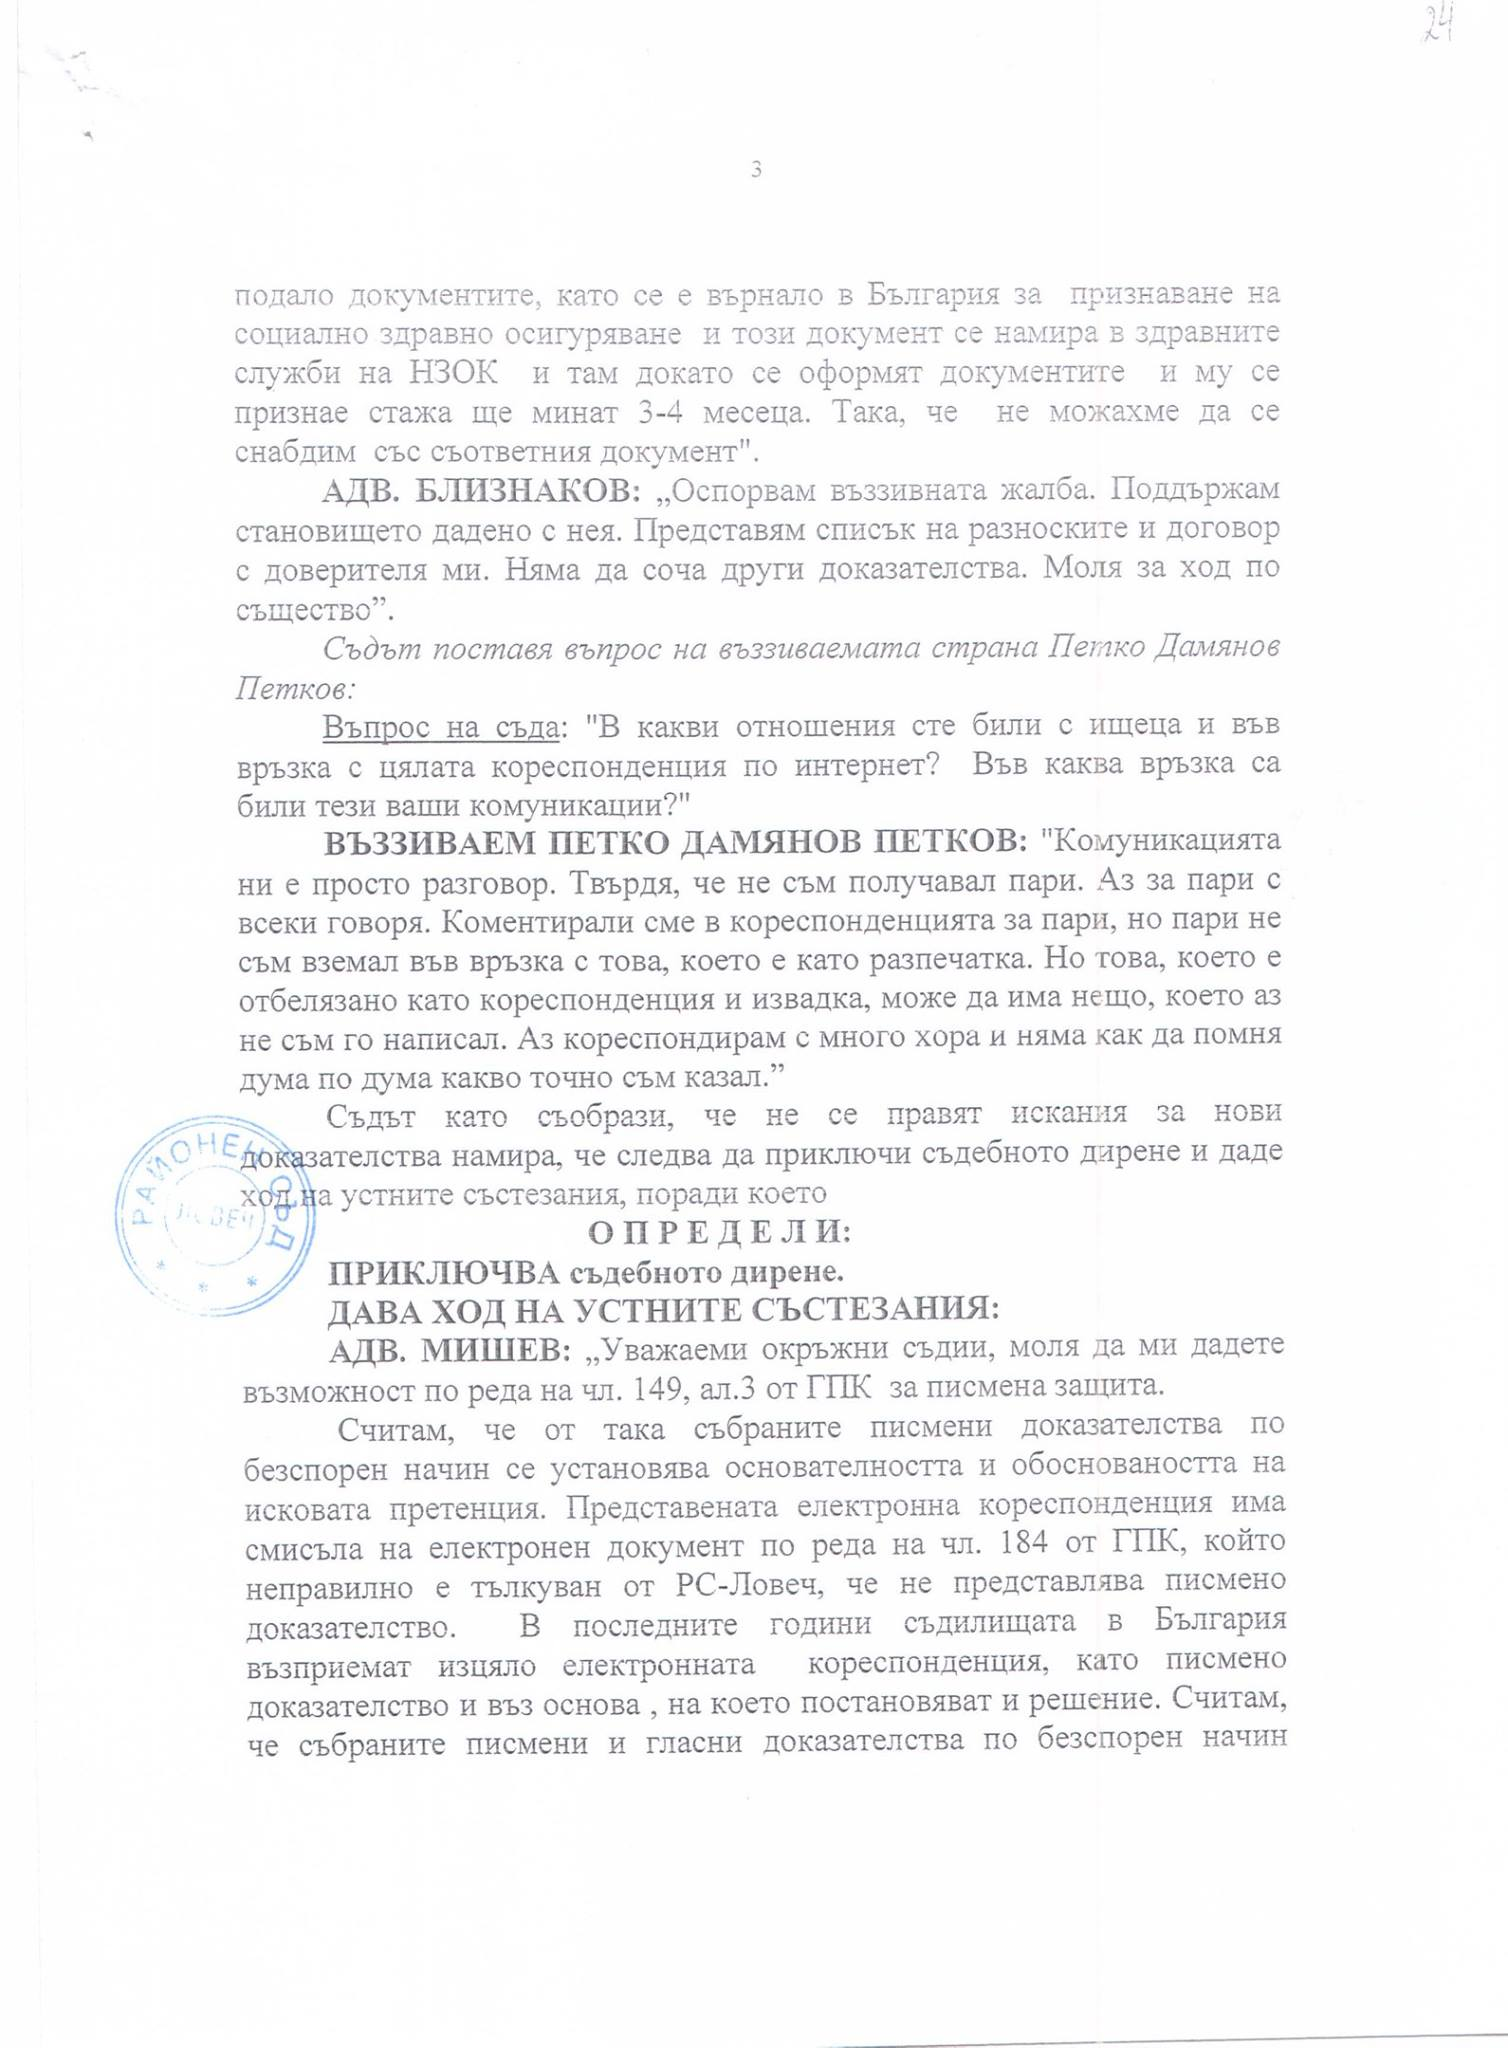 protokol-petkov-3